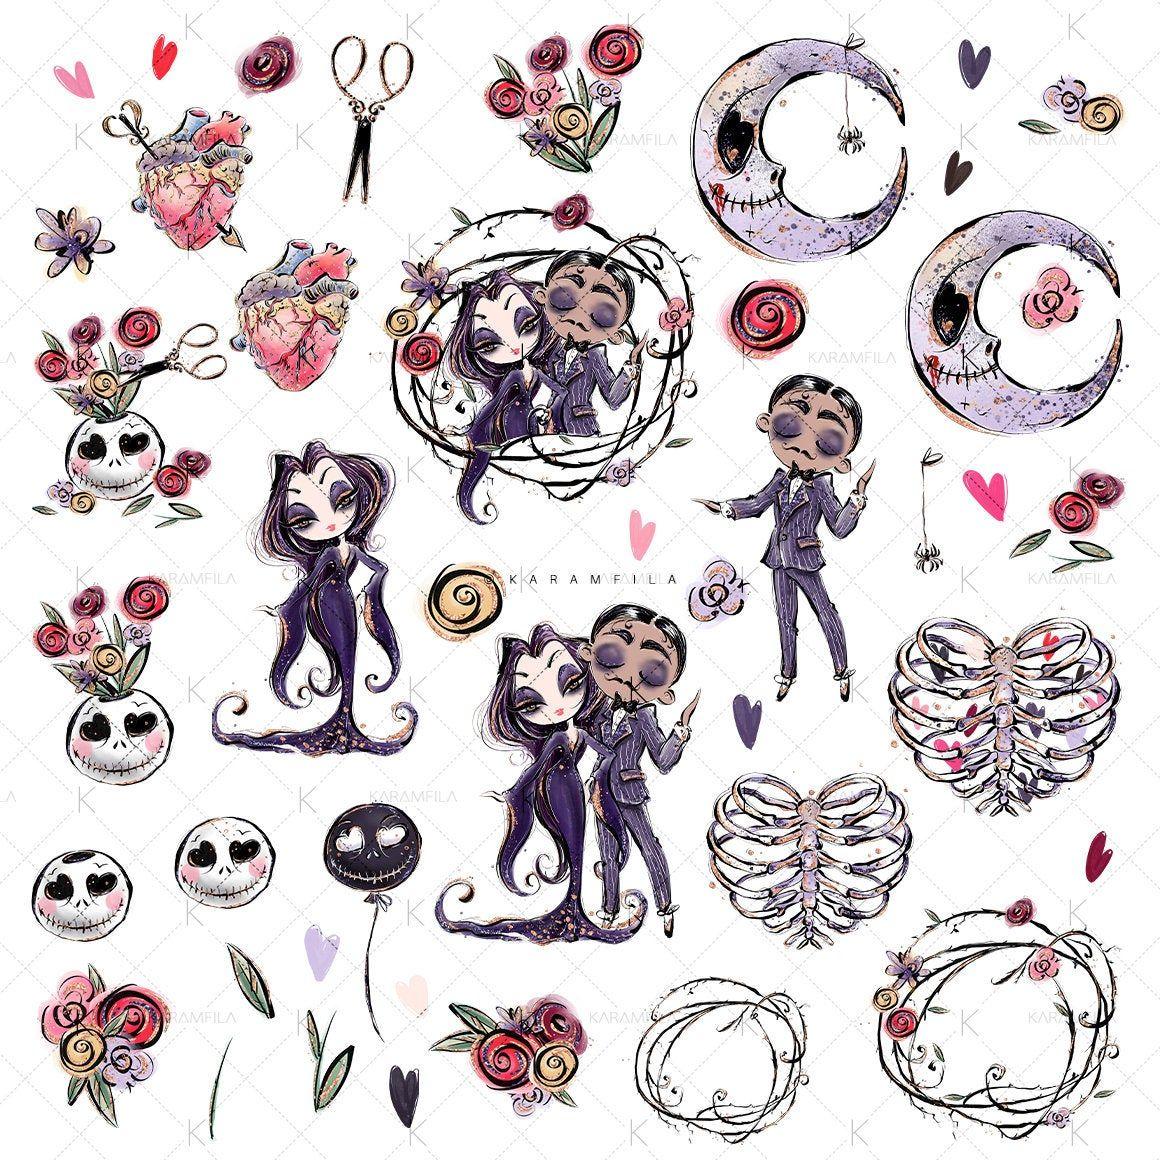 Ofertas Iphone Halloween 2020 Creepy Valentine's Day Clipart, Karamfila's Addams Clipart